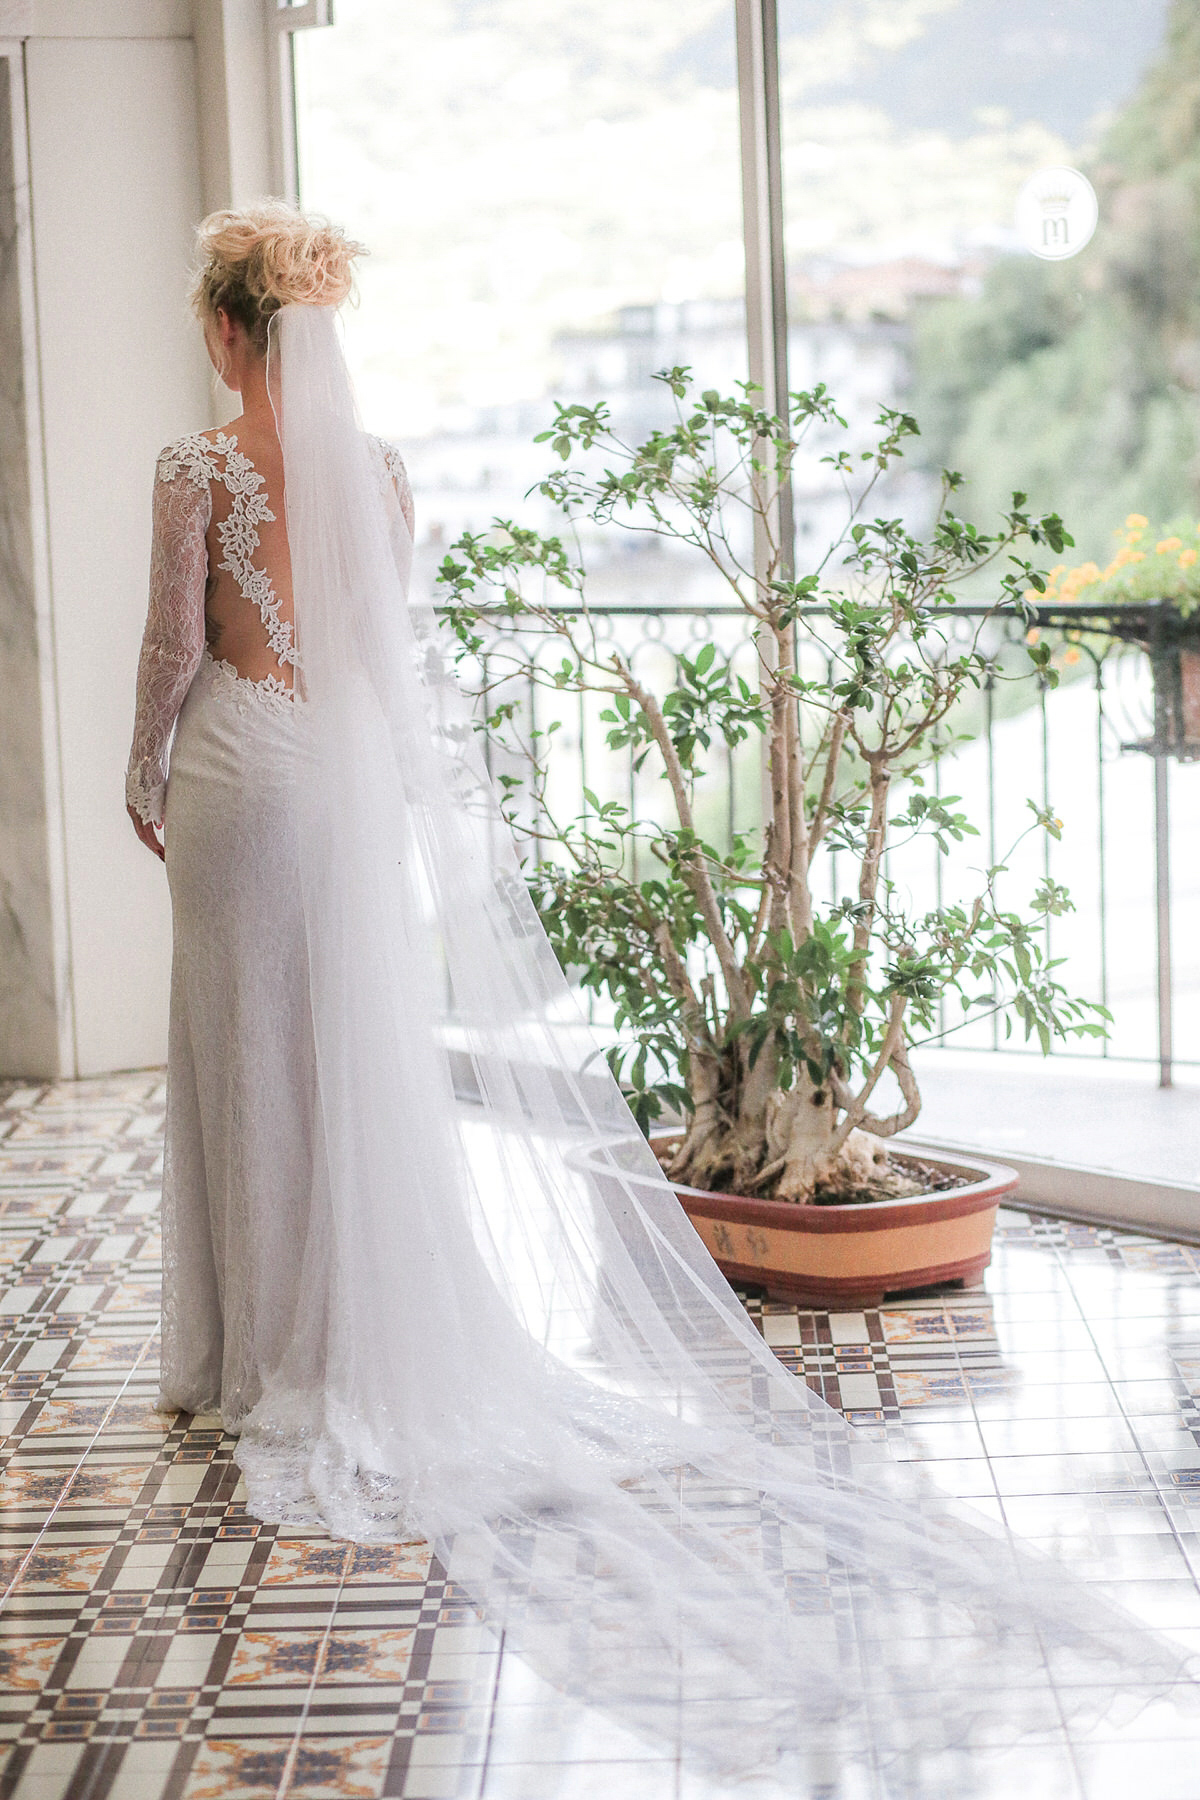 3893b56961c ... Charlotte Olympia Shoes and Riki Dalal Lace amalfi coast wedding -  Charlotte Olympia Shoes and Riki ...